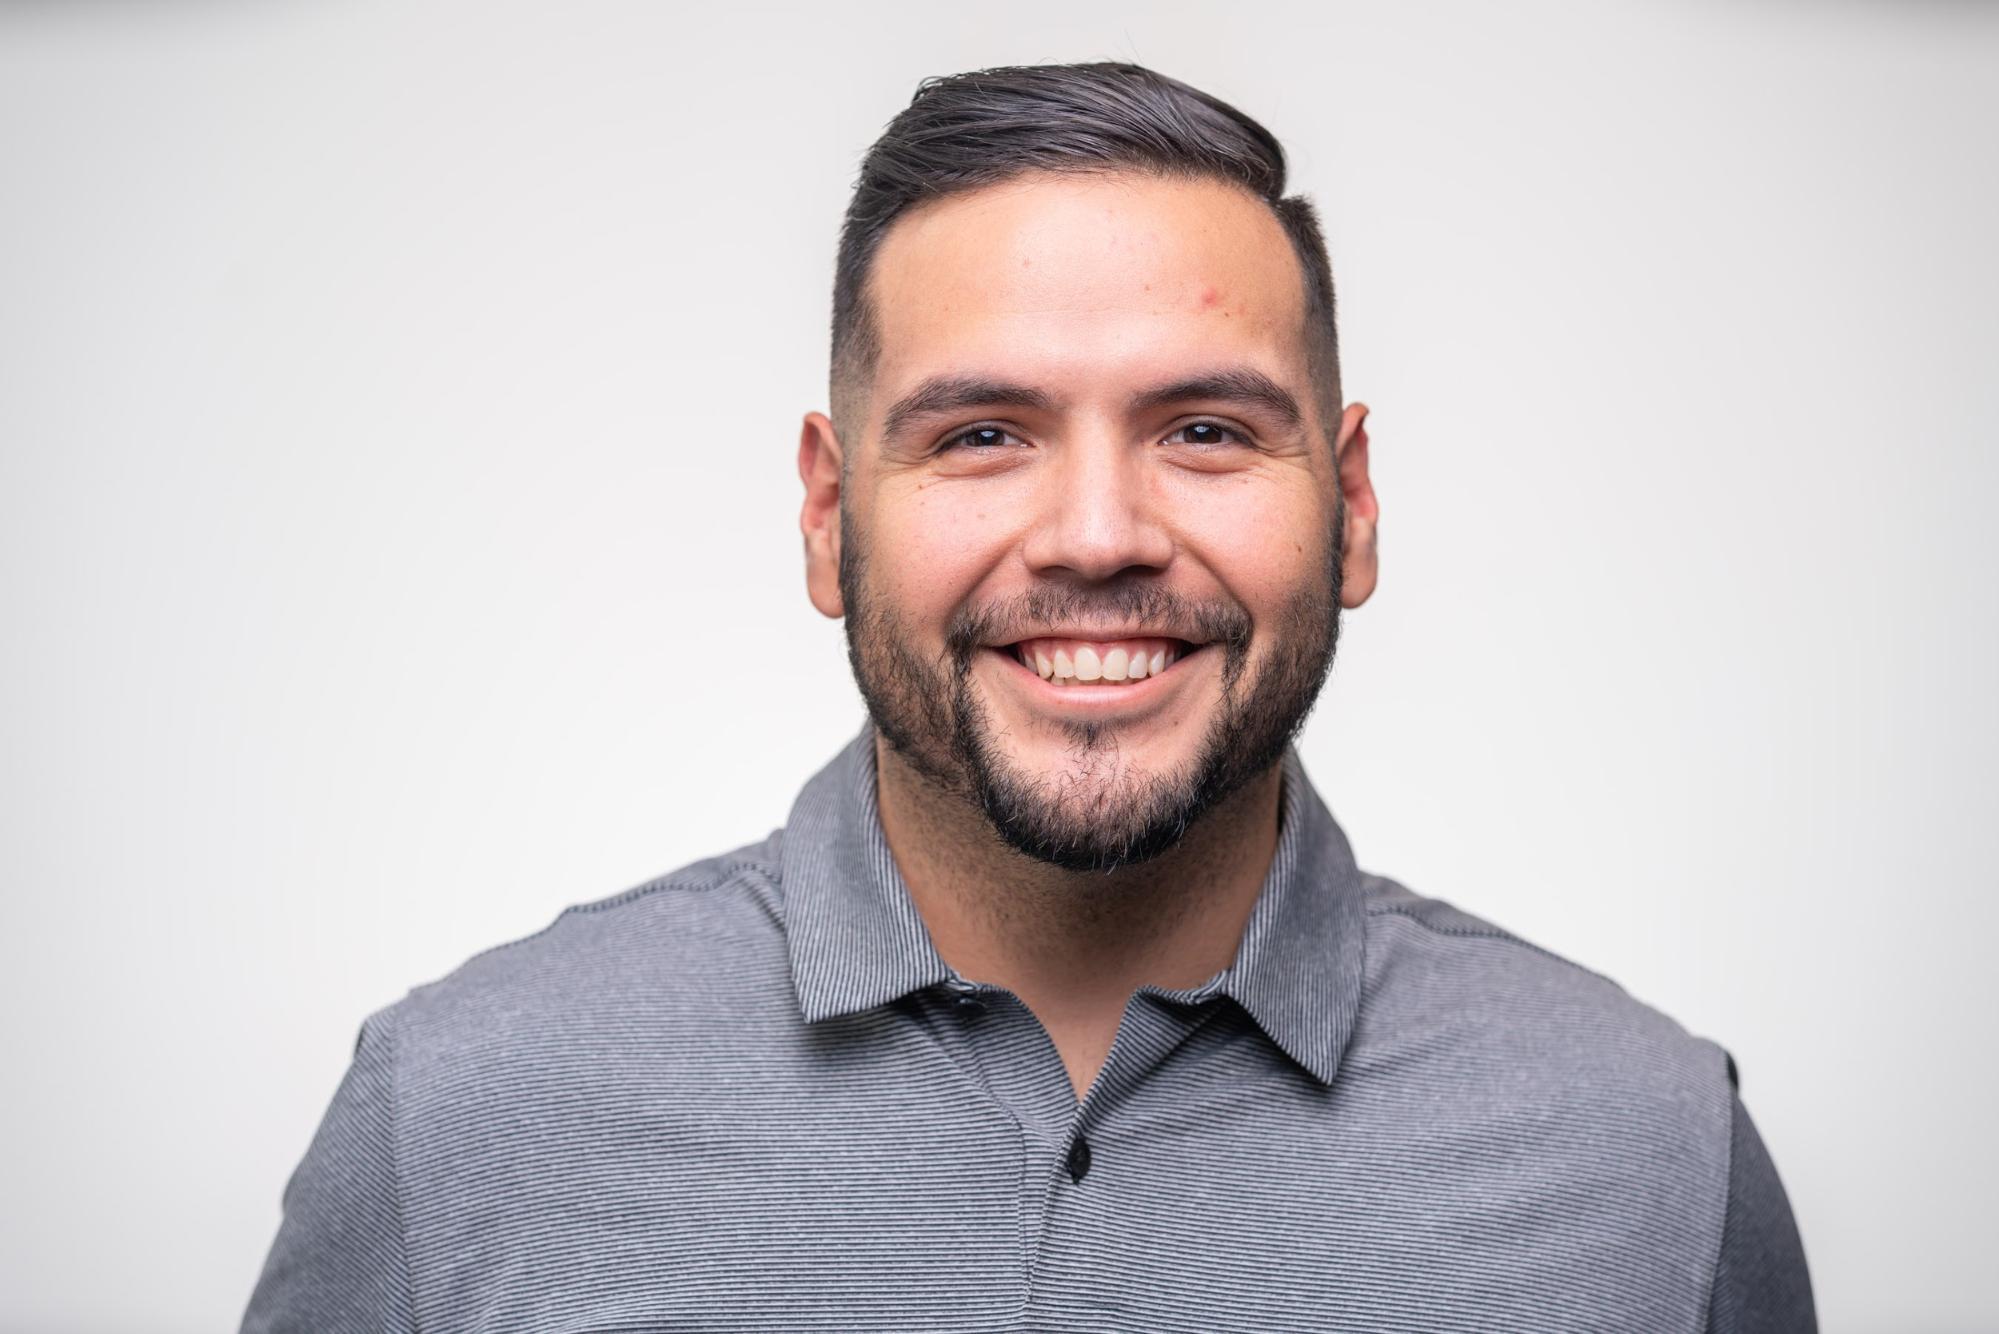 Daniel Reyna, Corporate Account Executive, Cloud, Austin, TX